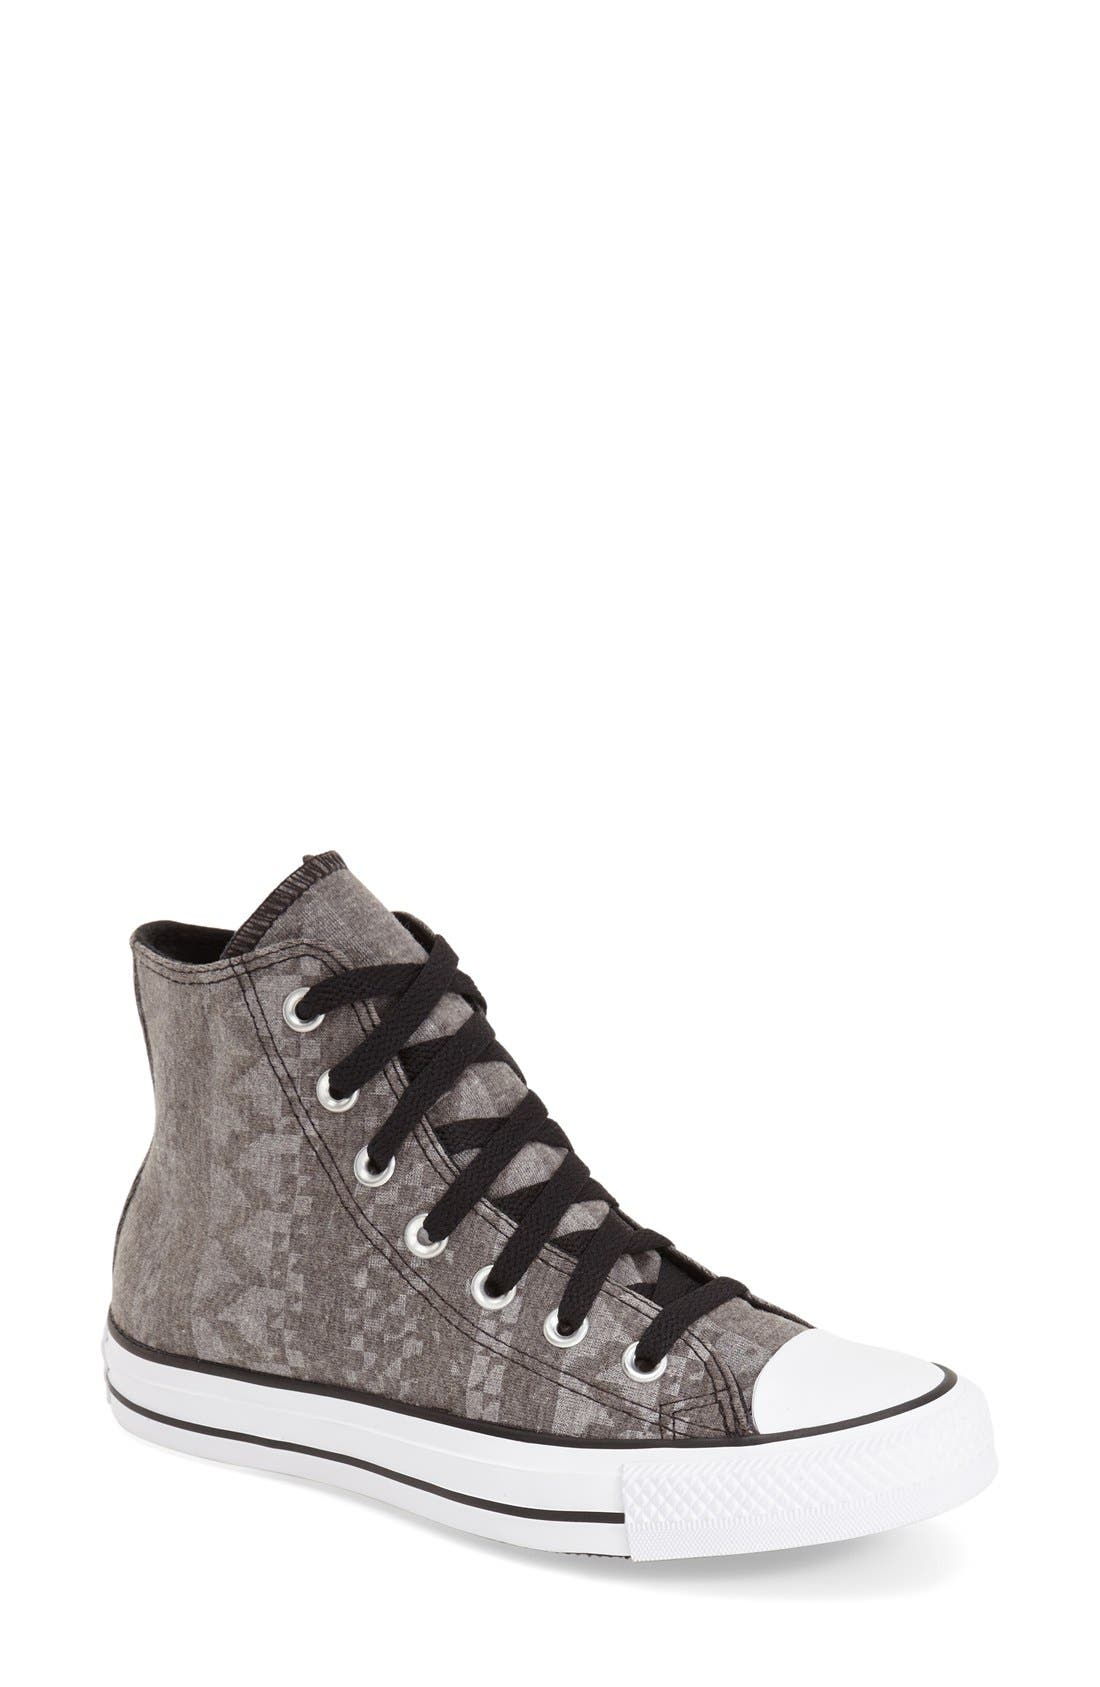 Alternate Image 1 Selected - Converse Chuck Taylor® All Star® Geo Print High Top Sneaker (Women)